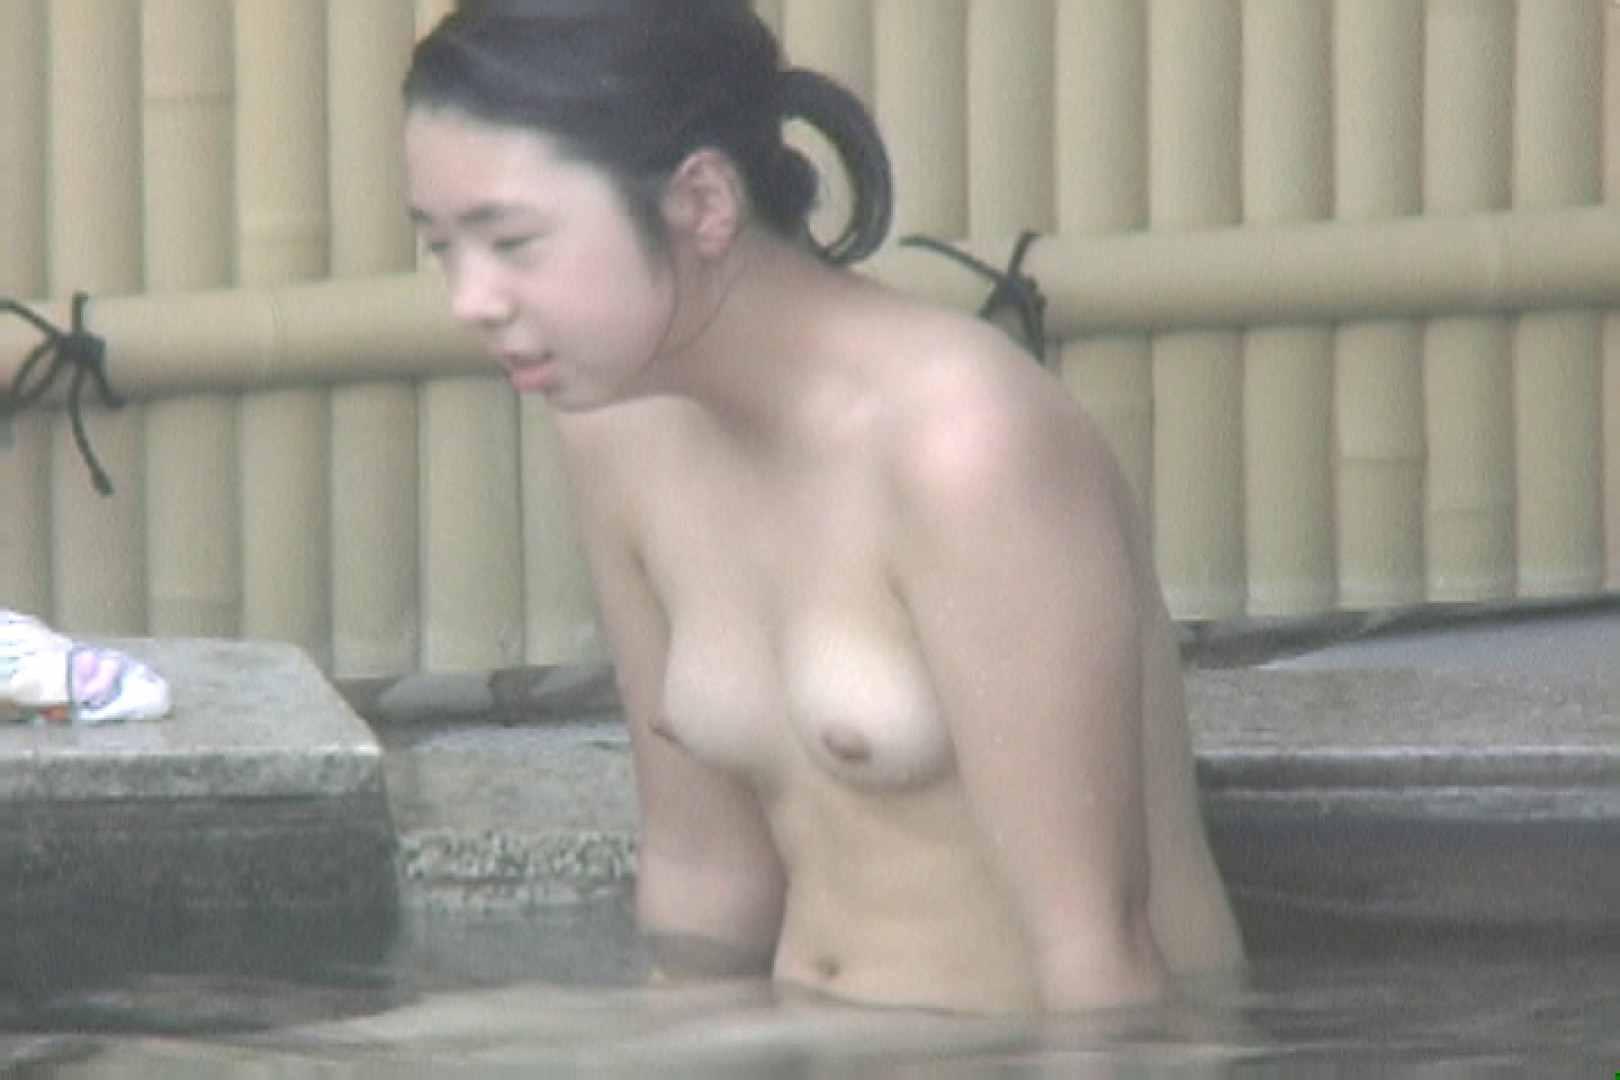 Aquaな露天風呂Vol.691 美しいOLの裸体 性交動画流出 75pic 26